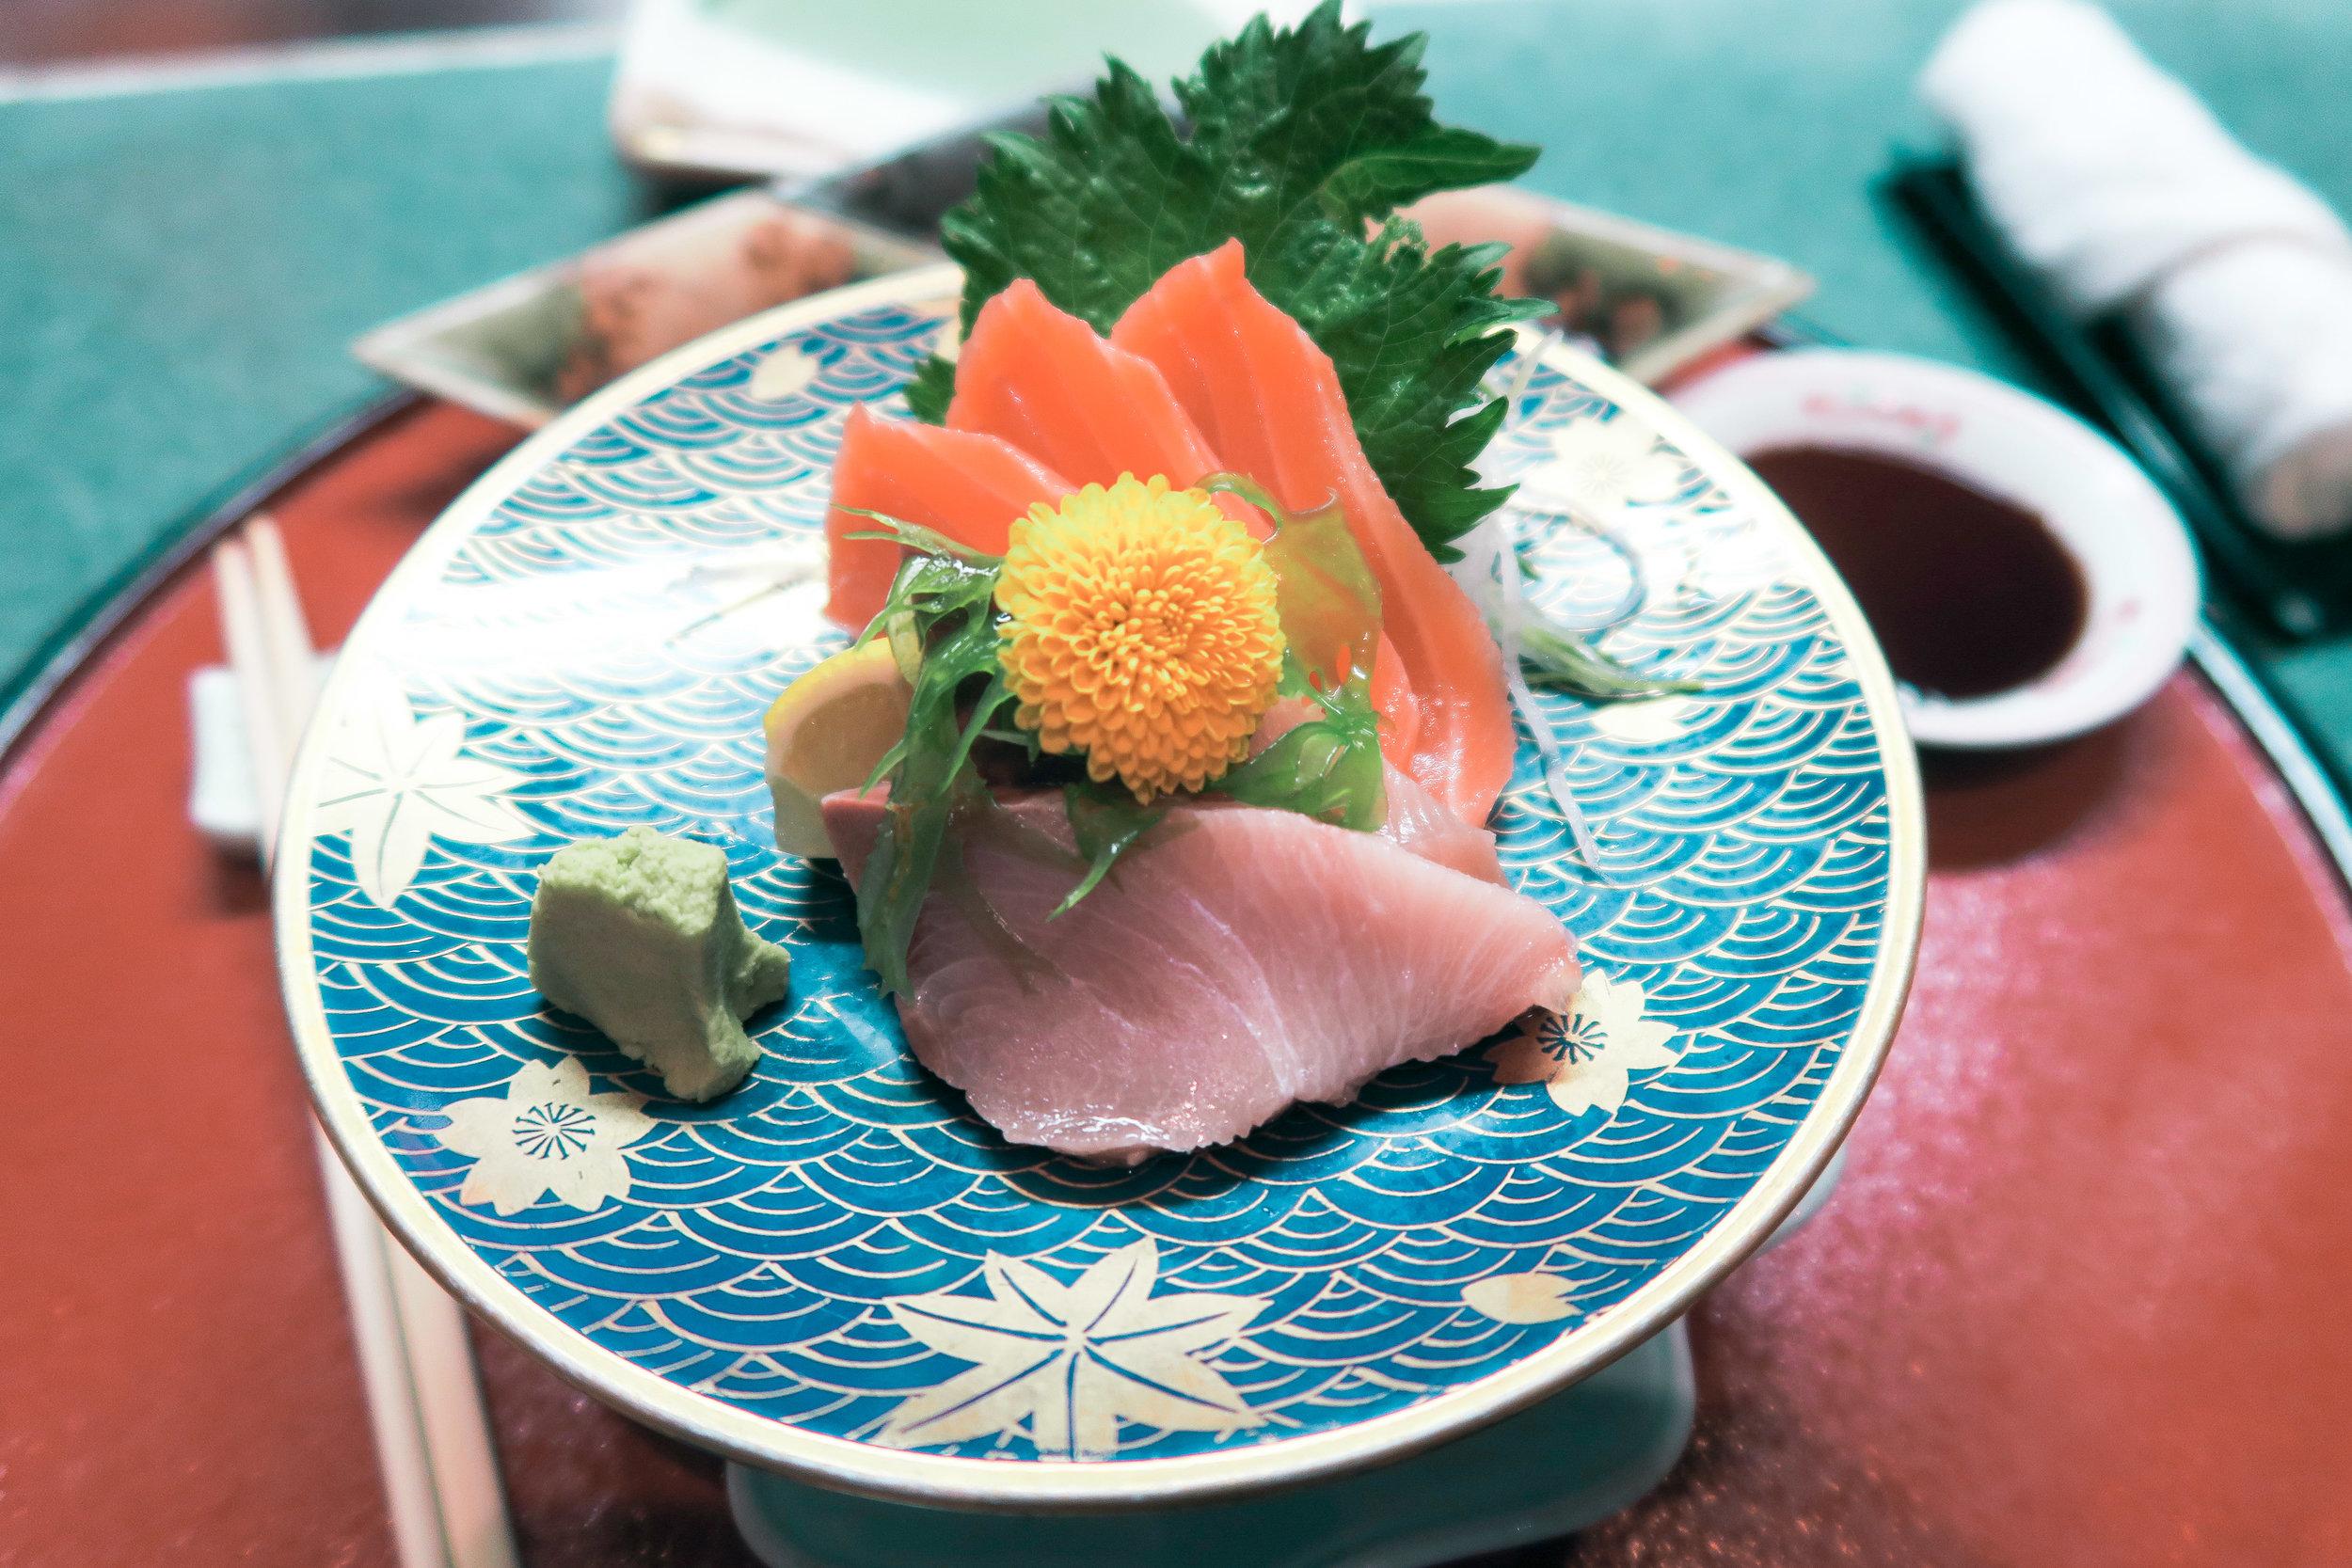 A beautiful plate of tuna & salmon sashimi for appetizers 😍